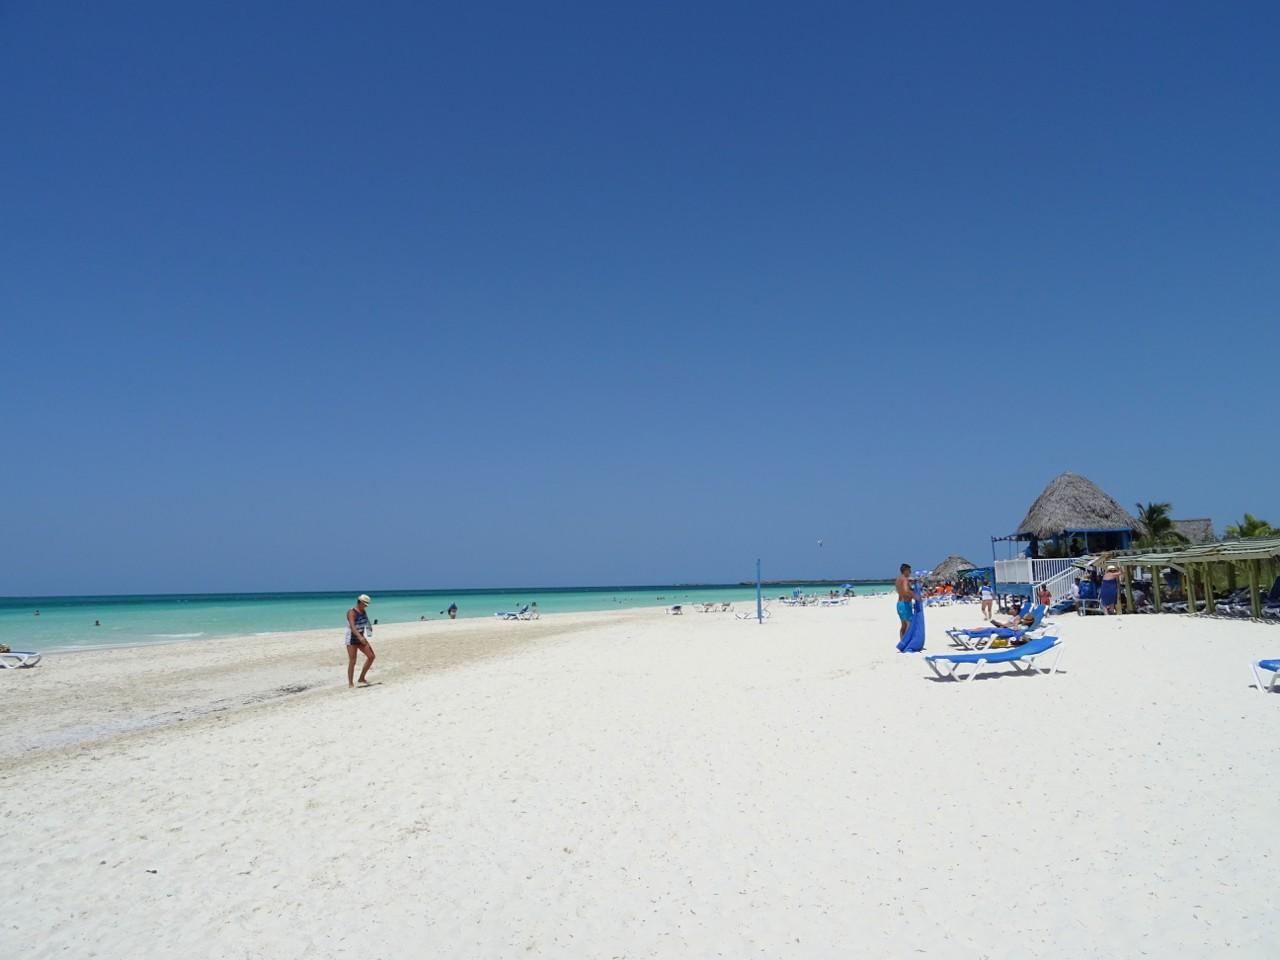 Beach weather in Cayo Guillermo Beach, Cayo Guillermo ...  |Beach Cayo Guillermo Cuba